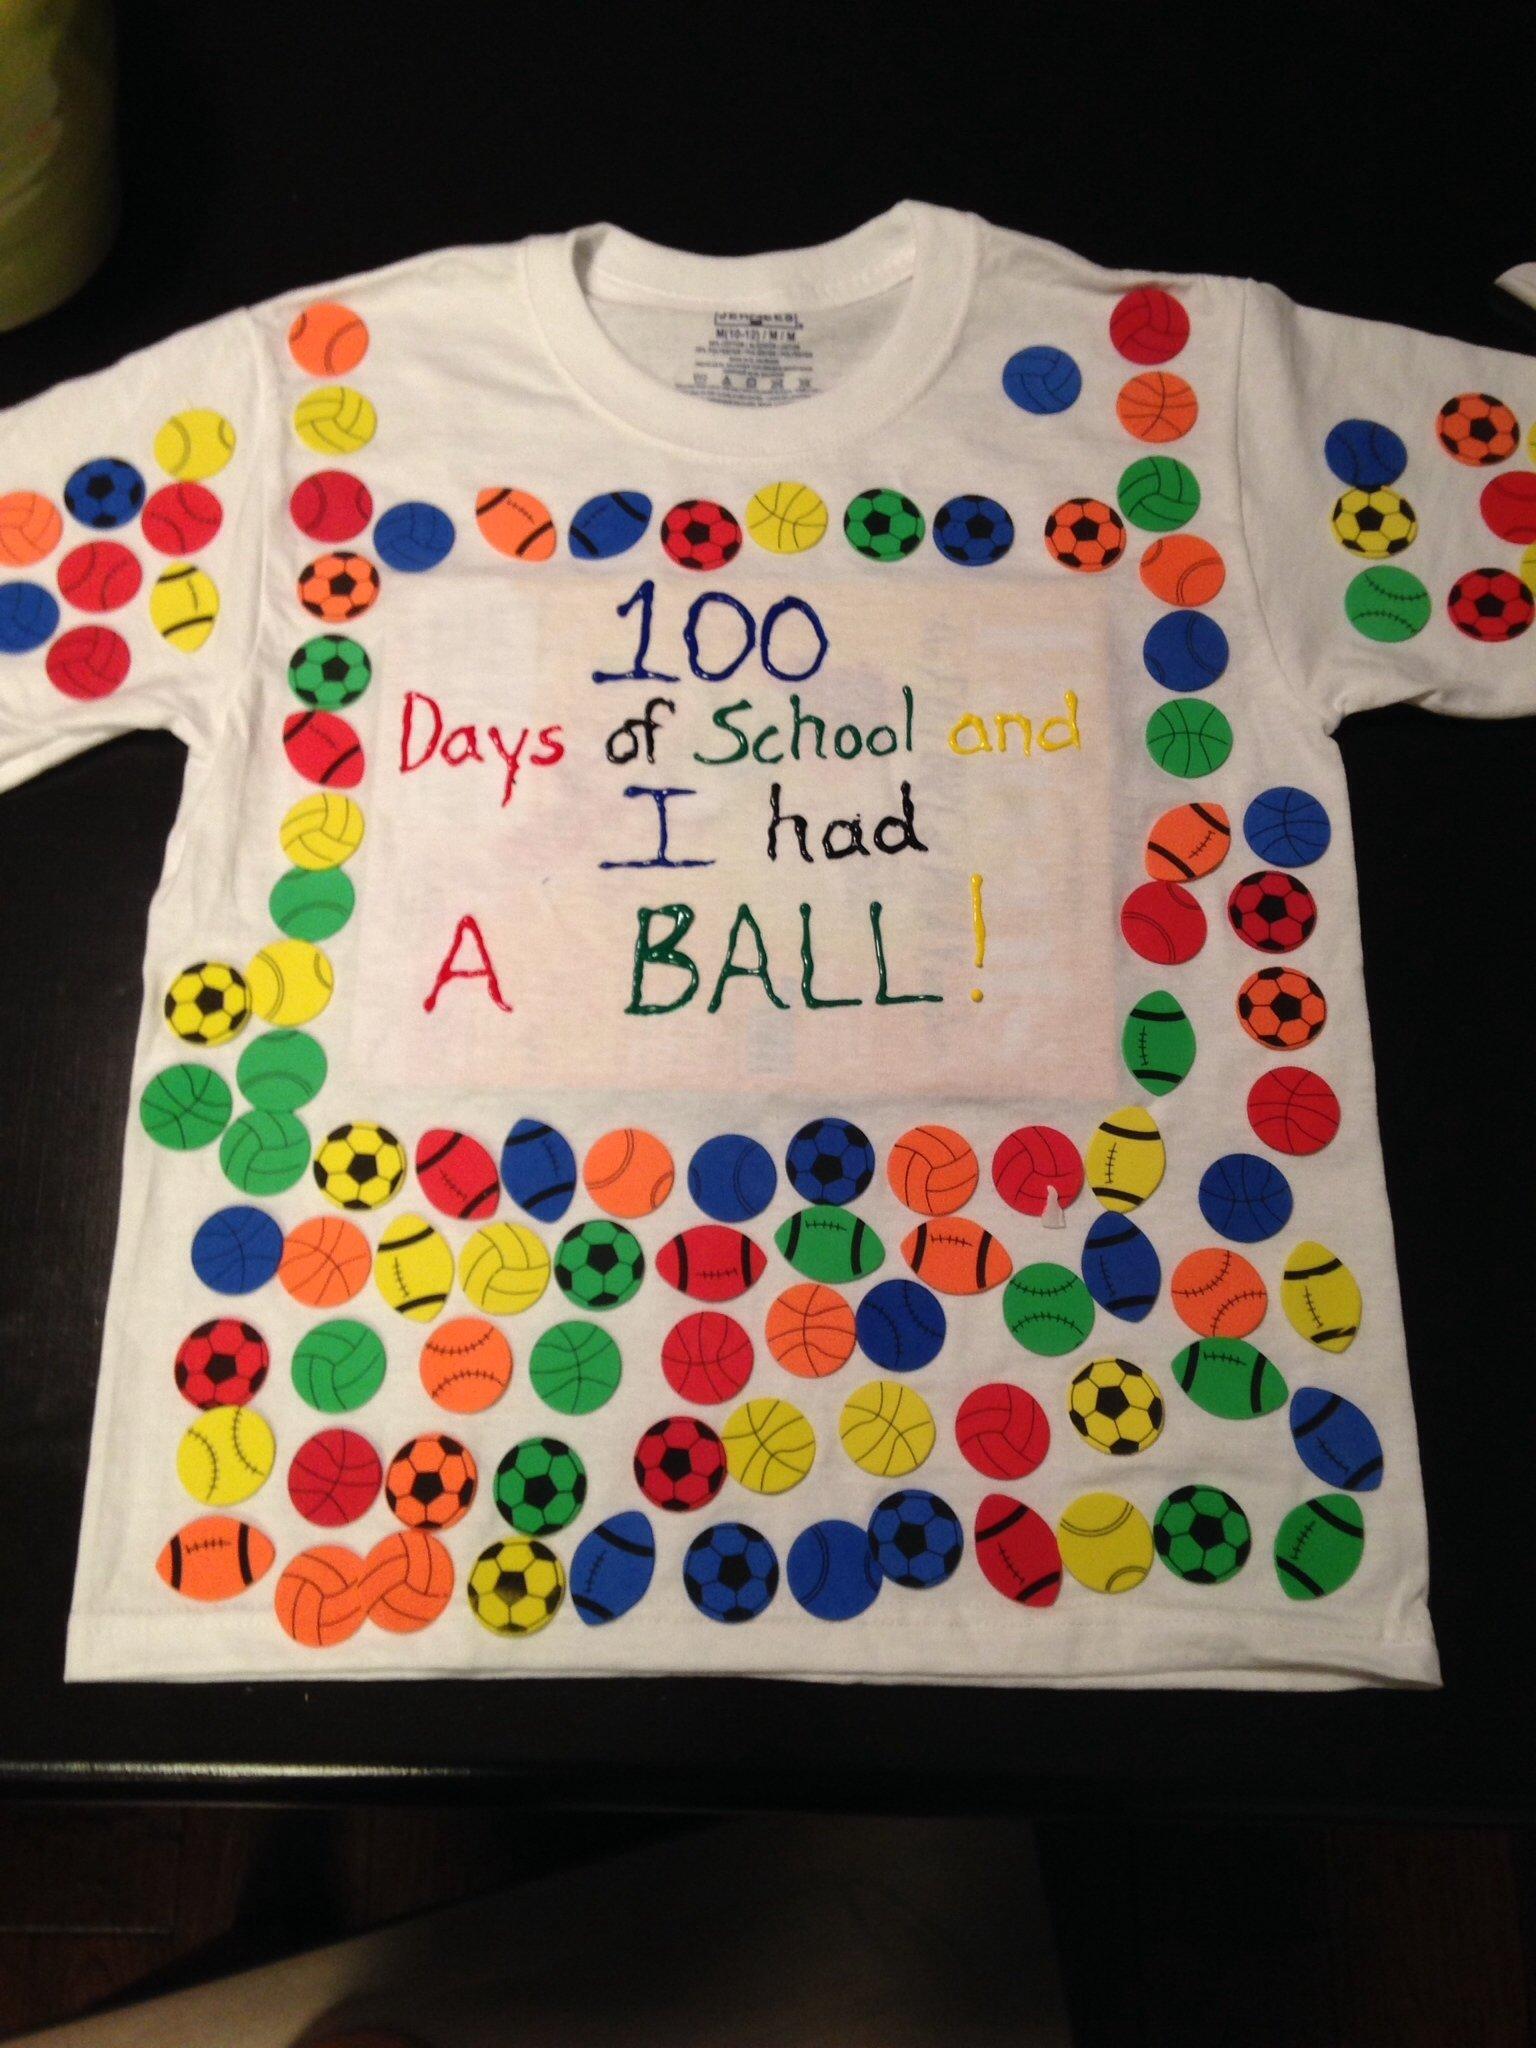 10 Amazing Ideas For The 100Th Day Of School 100 day of school t shirt foam stickers school stuff pinterest 7 2021